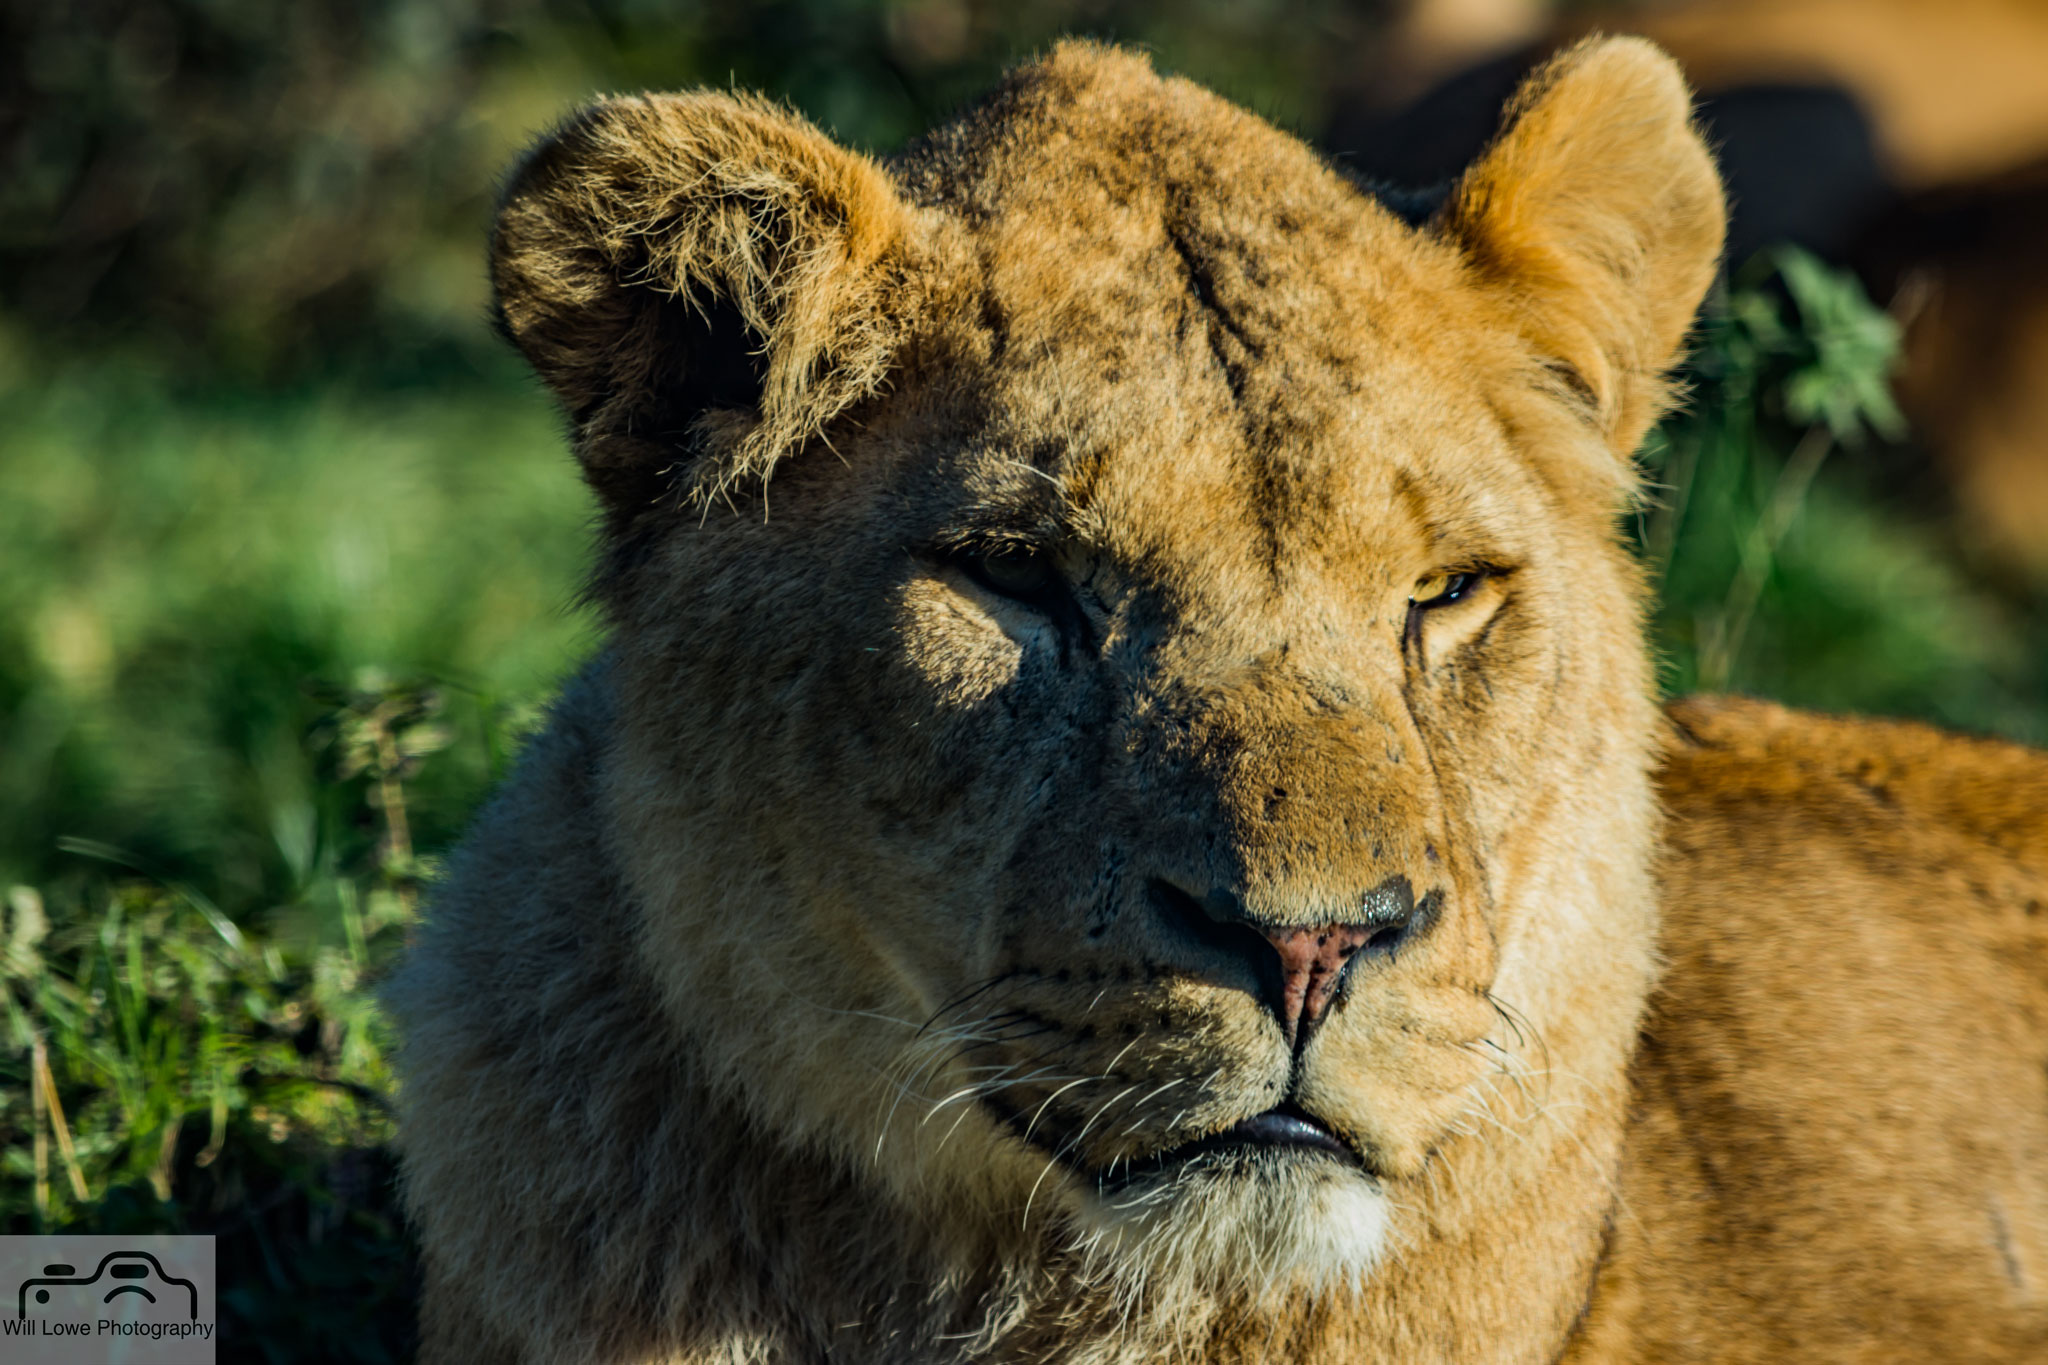 Lioness - Longleet